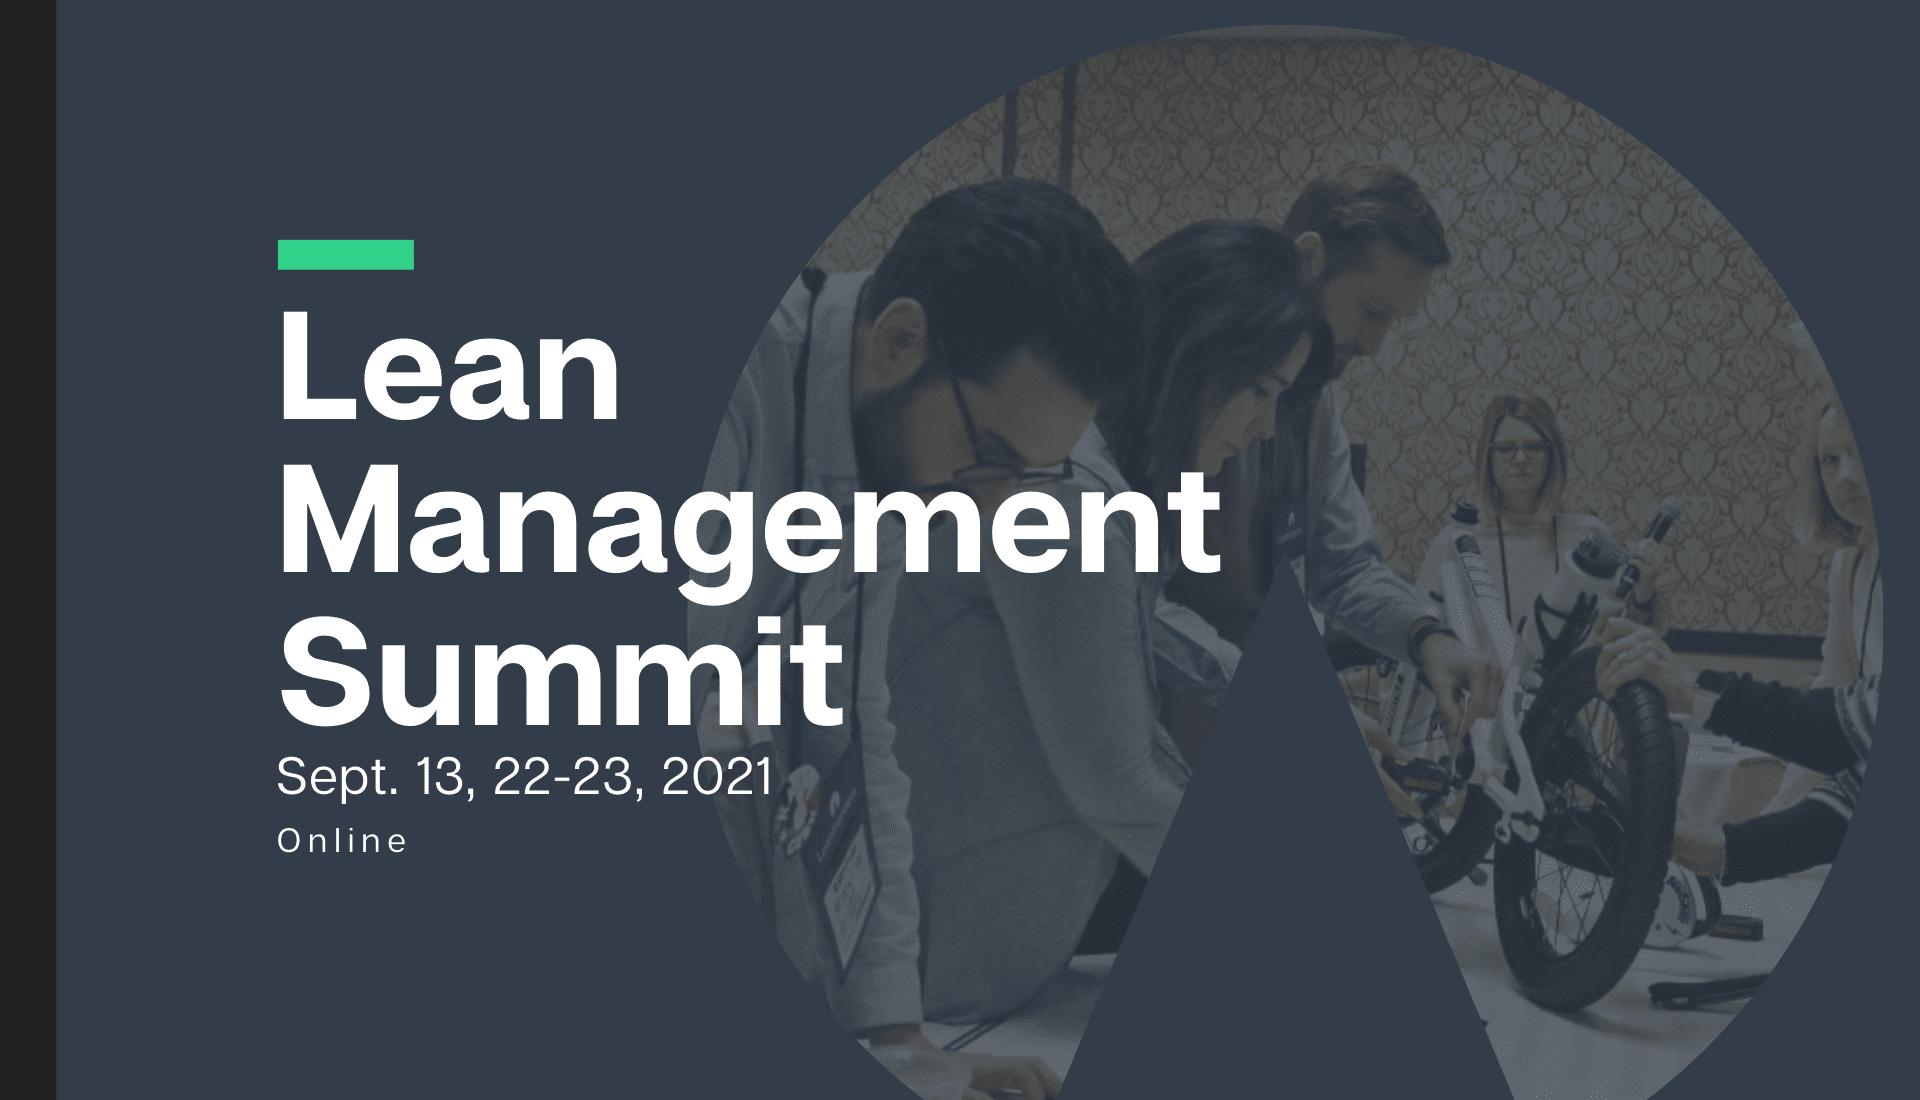 Lean Management Summit